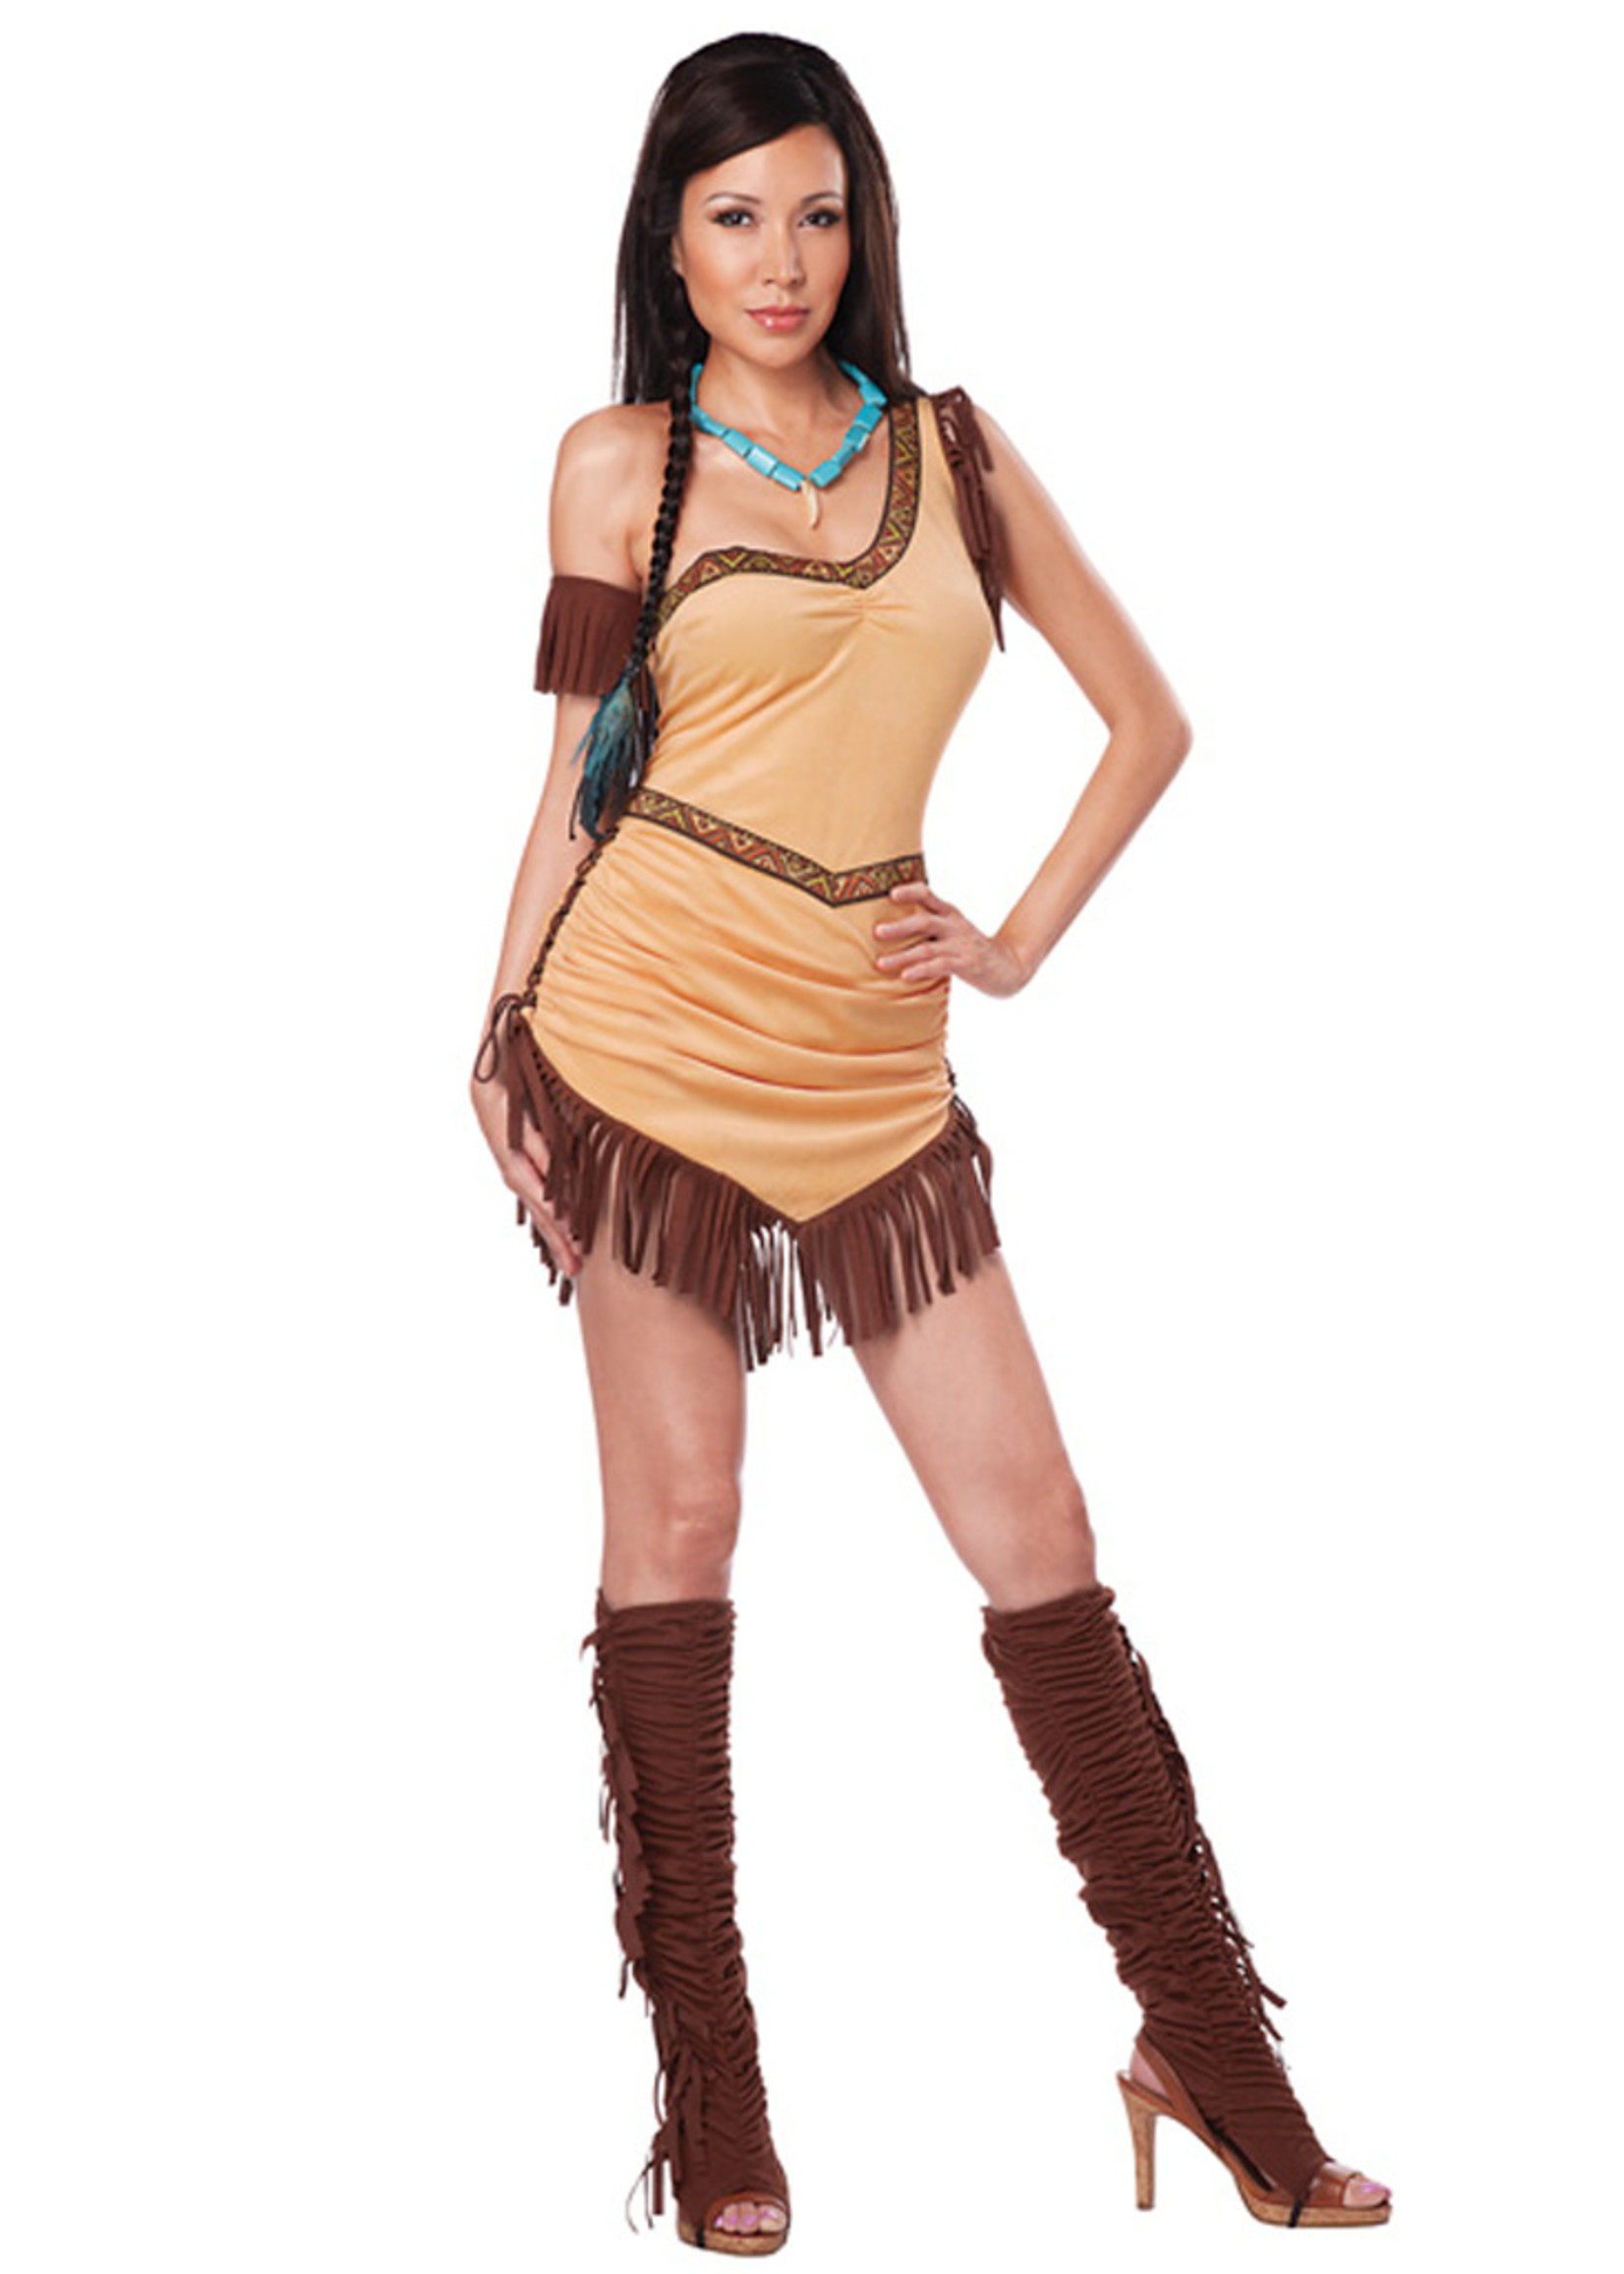 Native American Beauty Costume - Women's